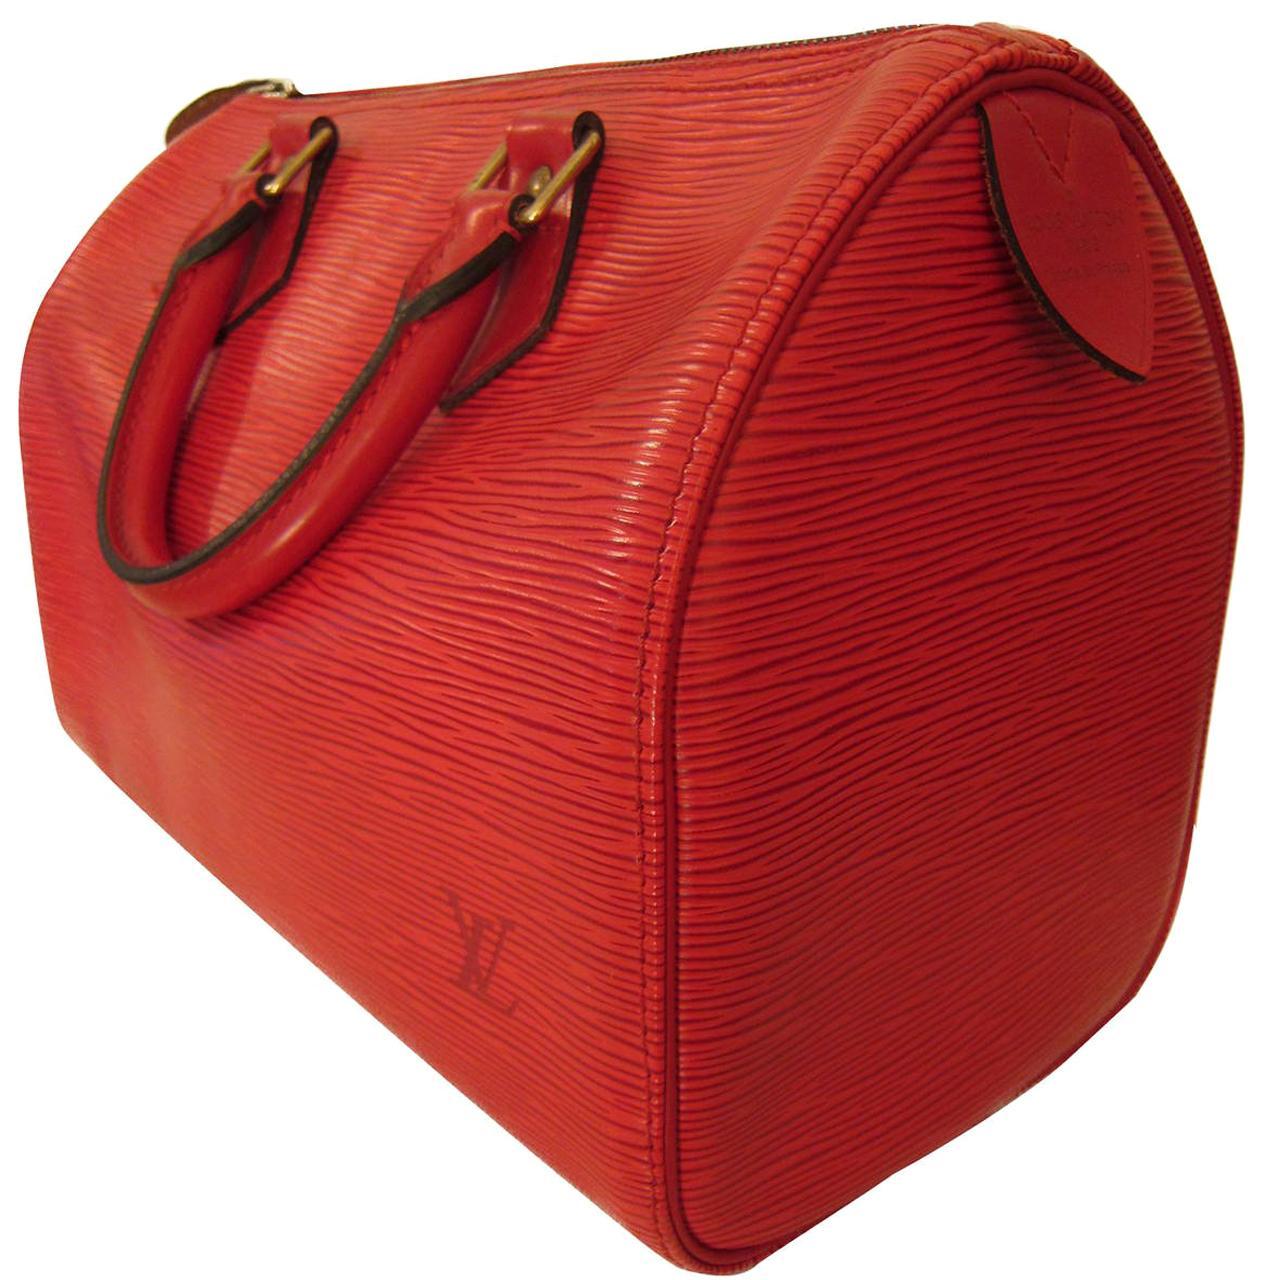 Louis Vuitton Speedy 30 Epi Red Handbag